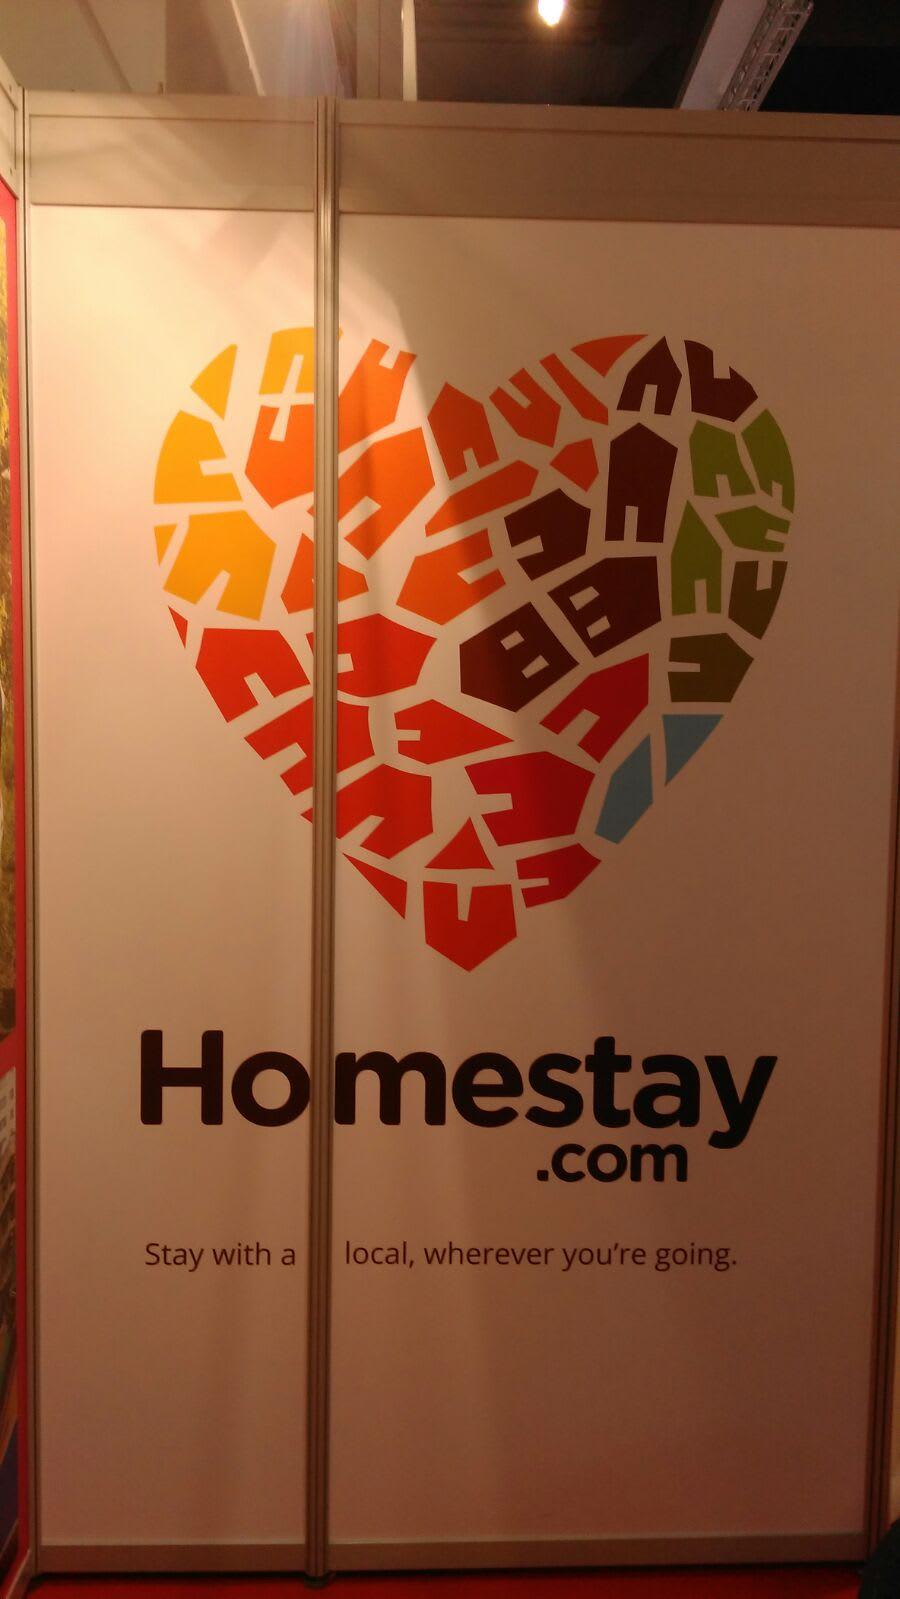 Homestay_ITB_Stall_Design_e03c8f32-3f91-4ca8-8e4c-43baff60b0d2